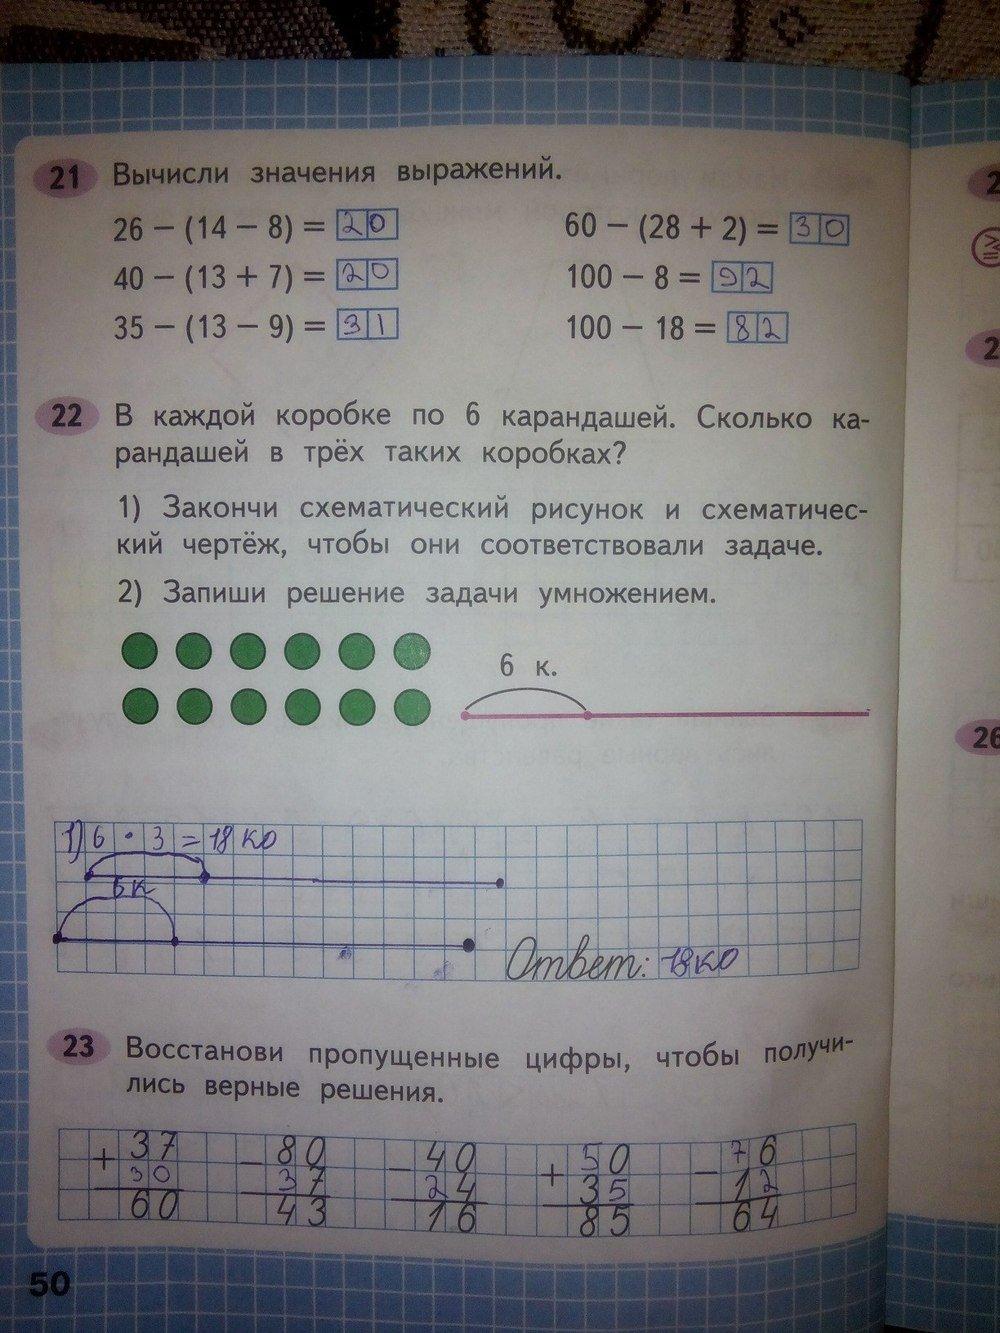 Дом задание по математике 2 класс Моро